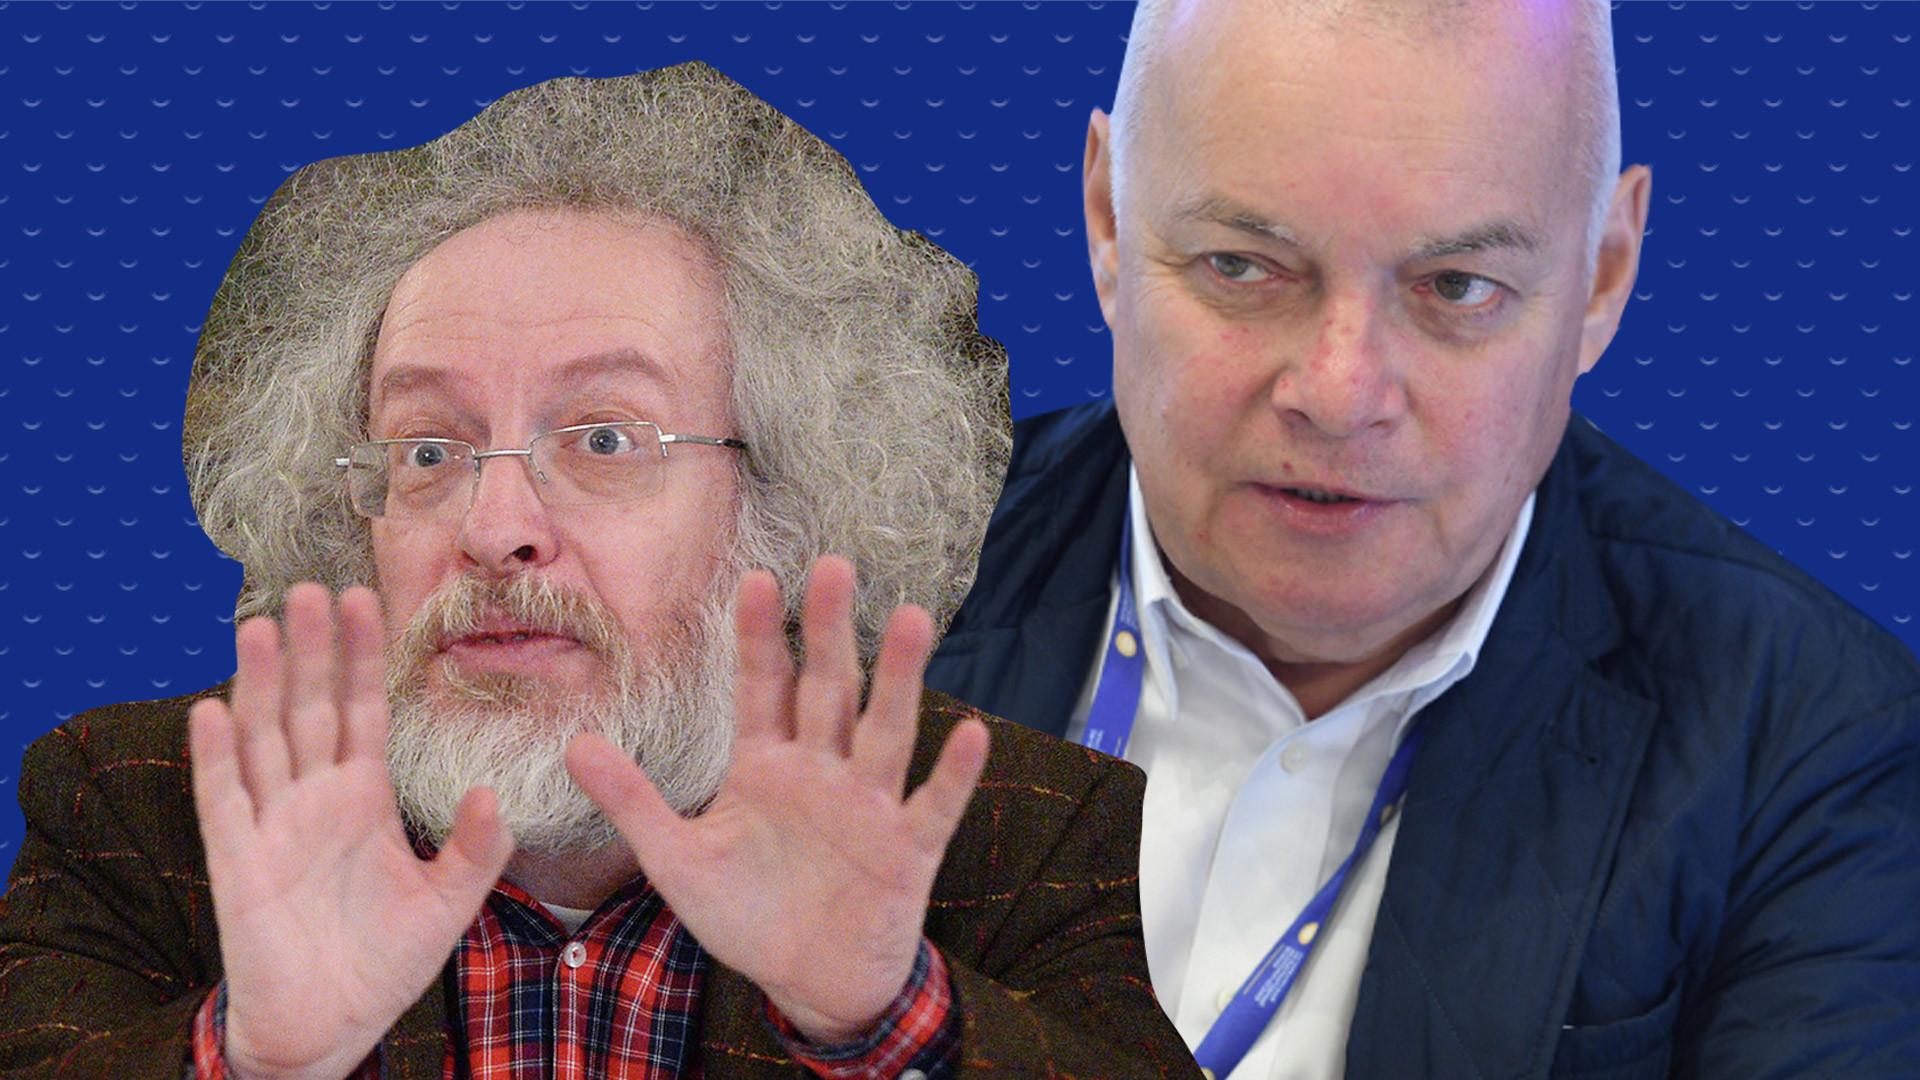 <p>Алексей Венедиктов (слева), Дмитрий Рогозин (справа). Фото: Фото: &copy; РИА Новости /&nbsp;Алексей Филиппов, Рамиль Ситдиков. Коллаж: &copy;L!FE</p>